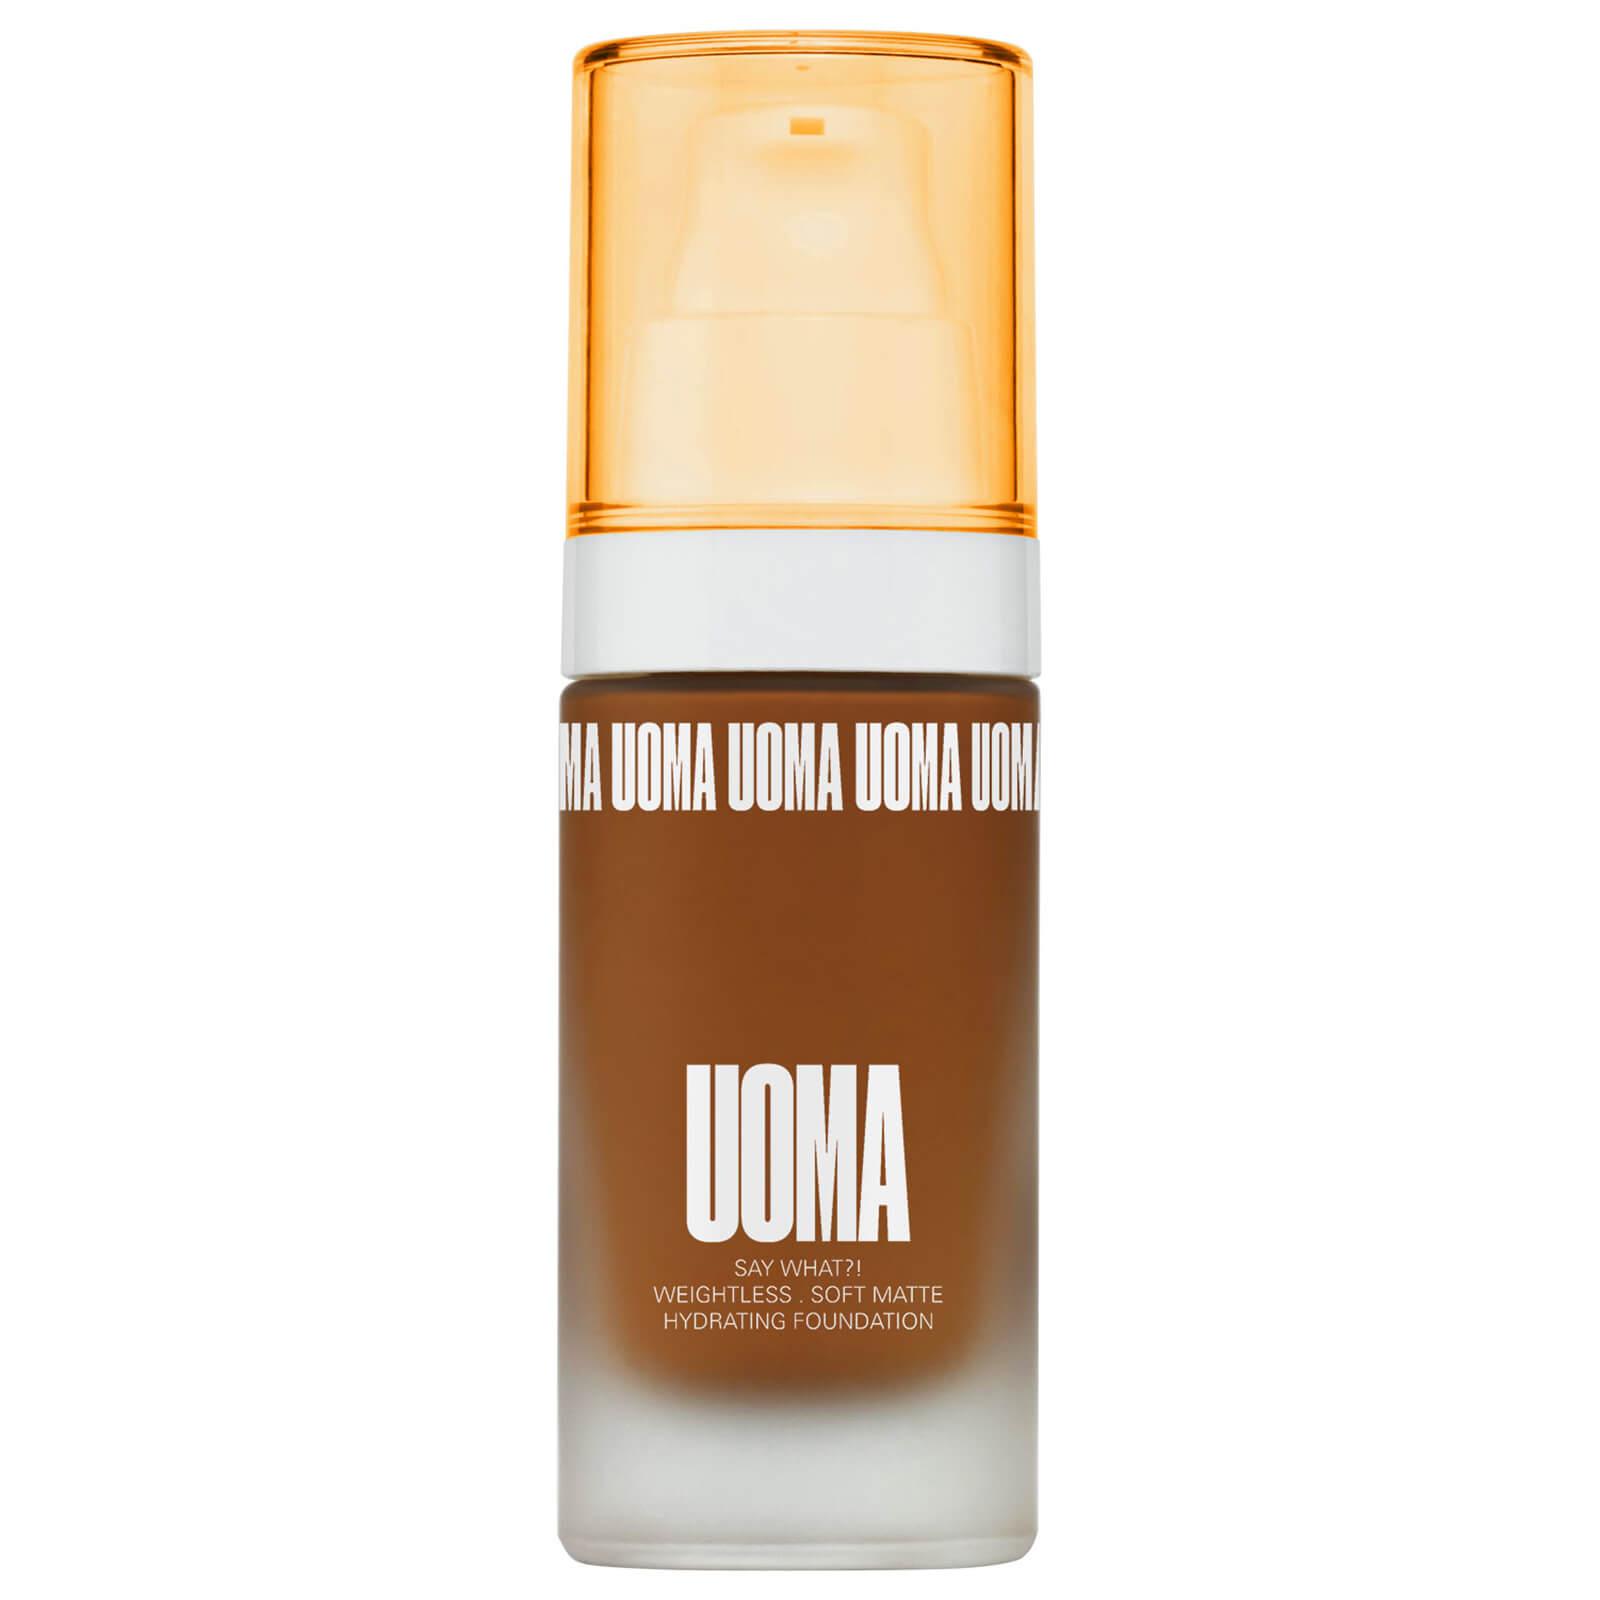 Купить UOMA Beauty Say What Foundation 30ml (Various Shades) - Brown Sugar T4C